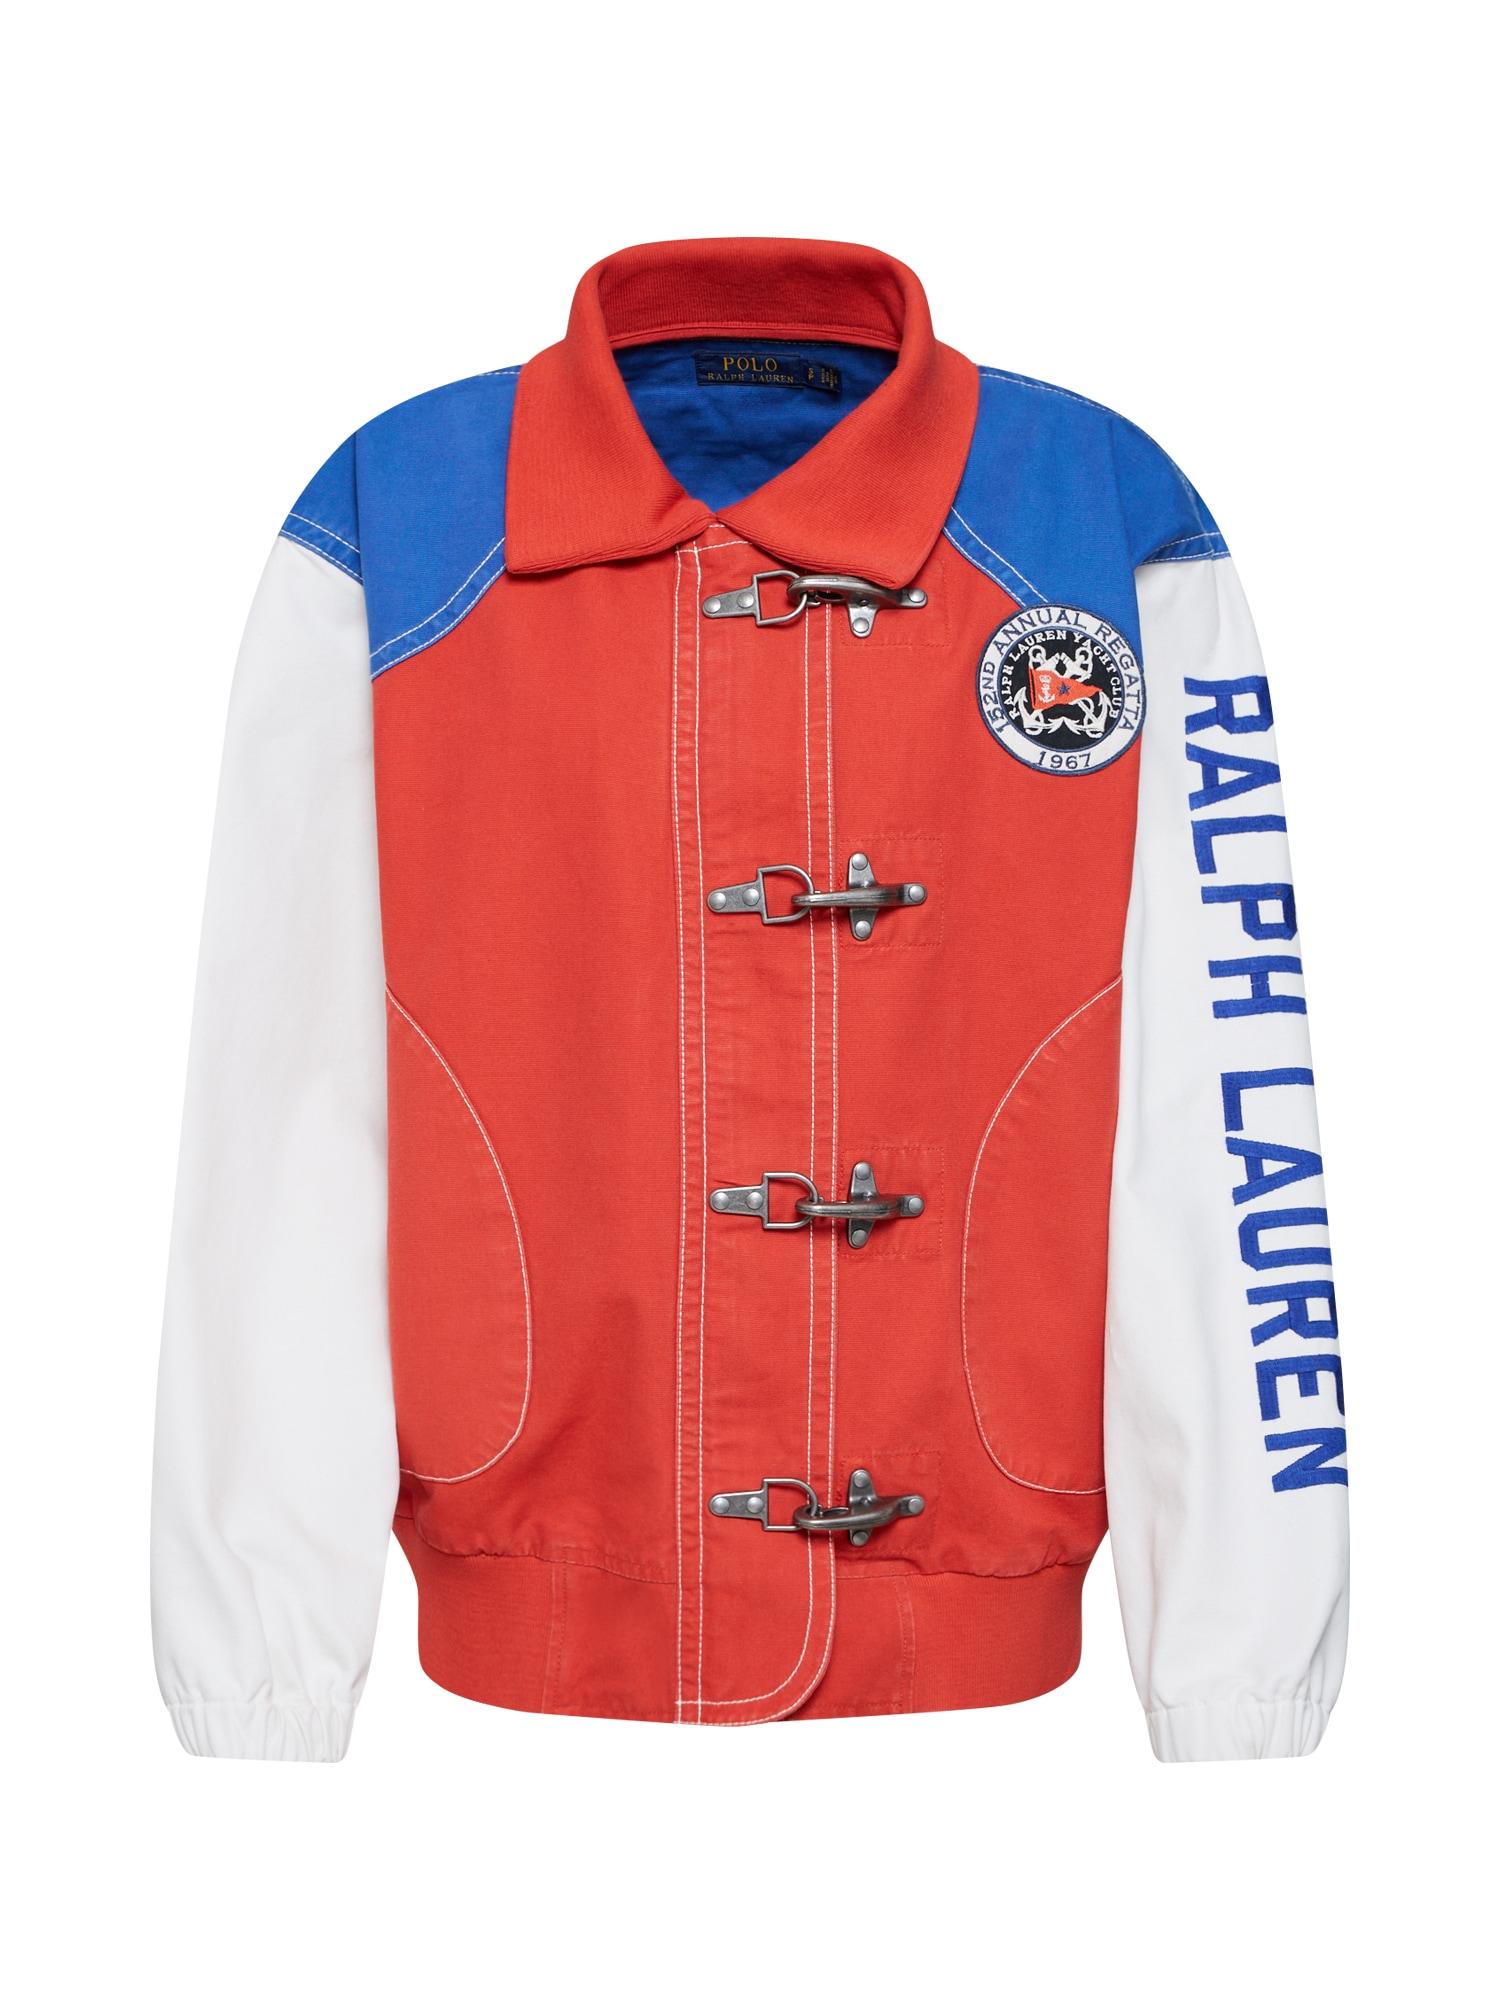 Přechodná bunda modrá červená bílá POLO RALPH LAUREN